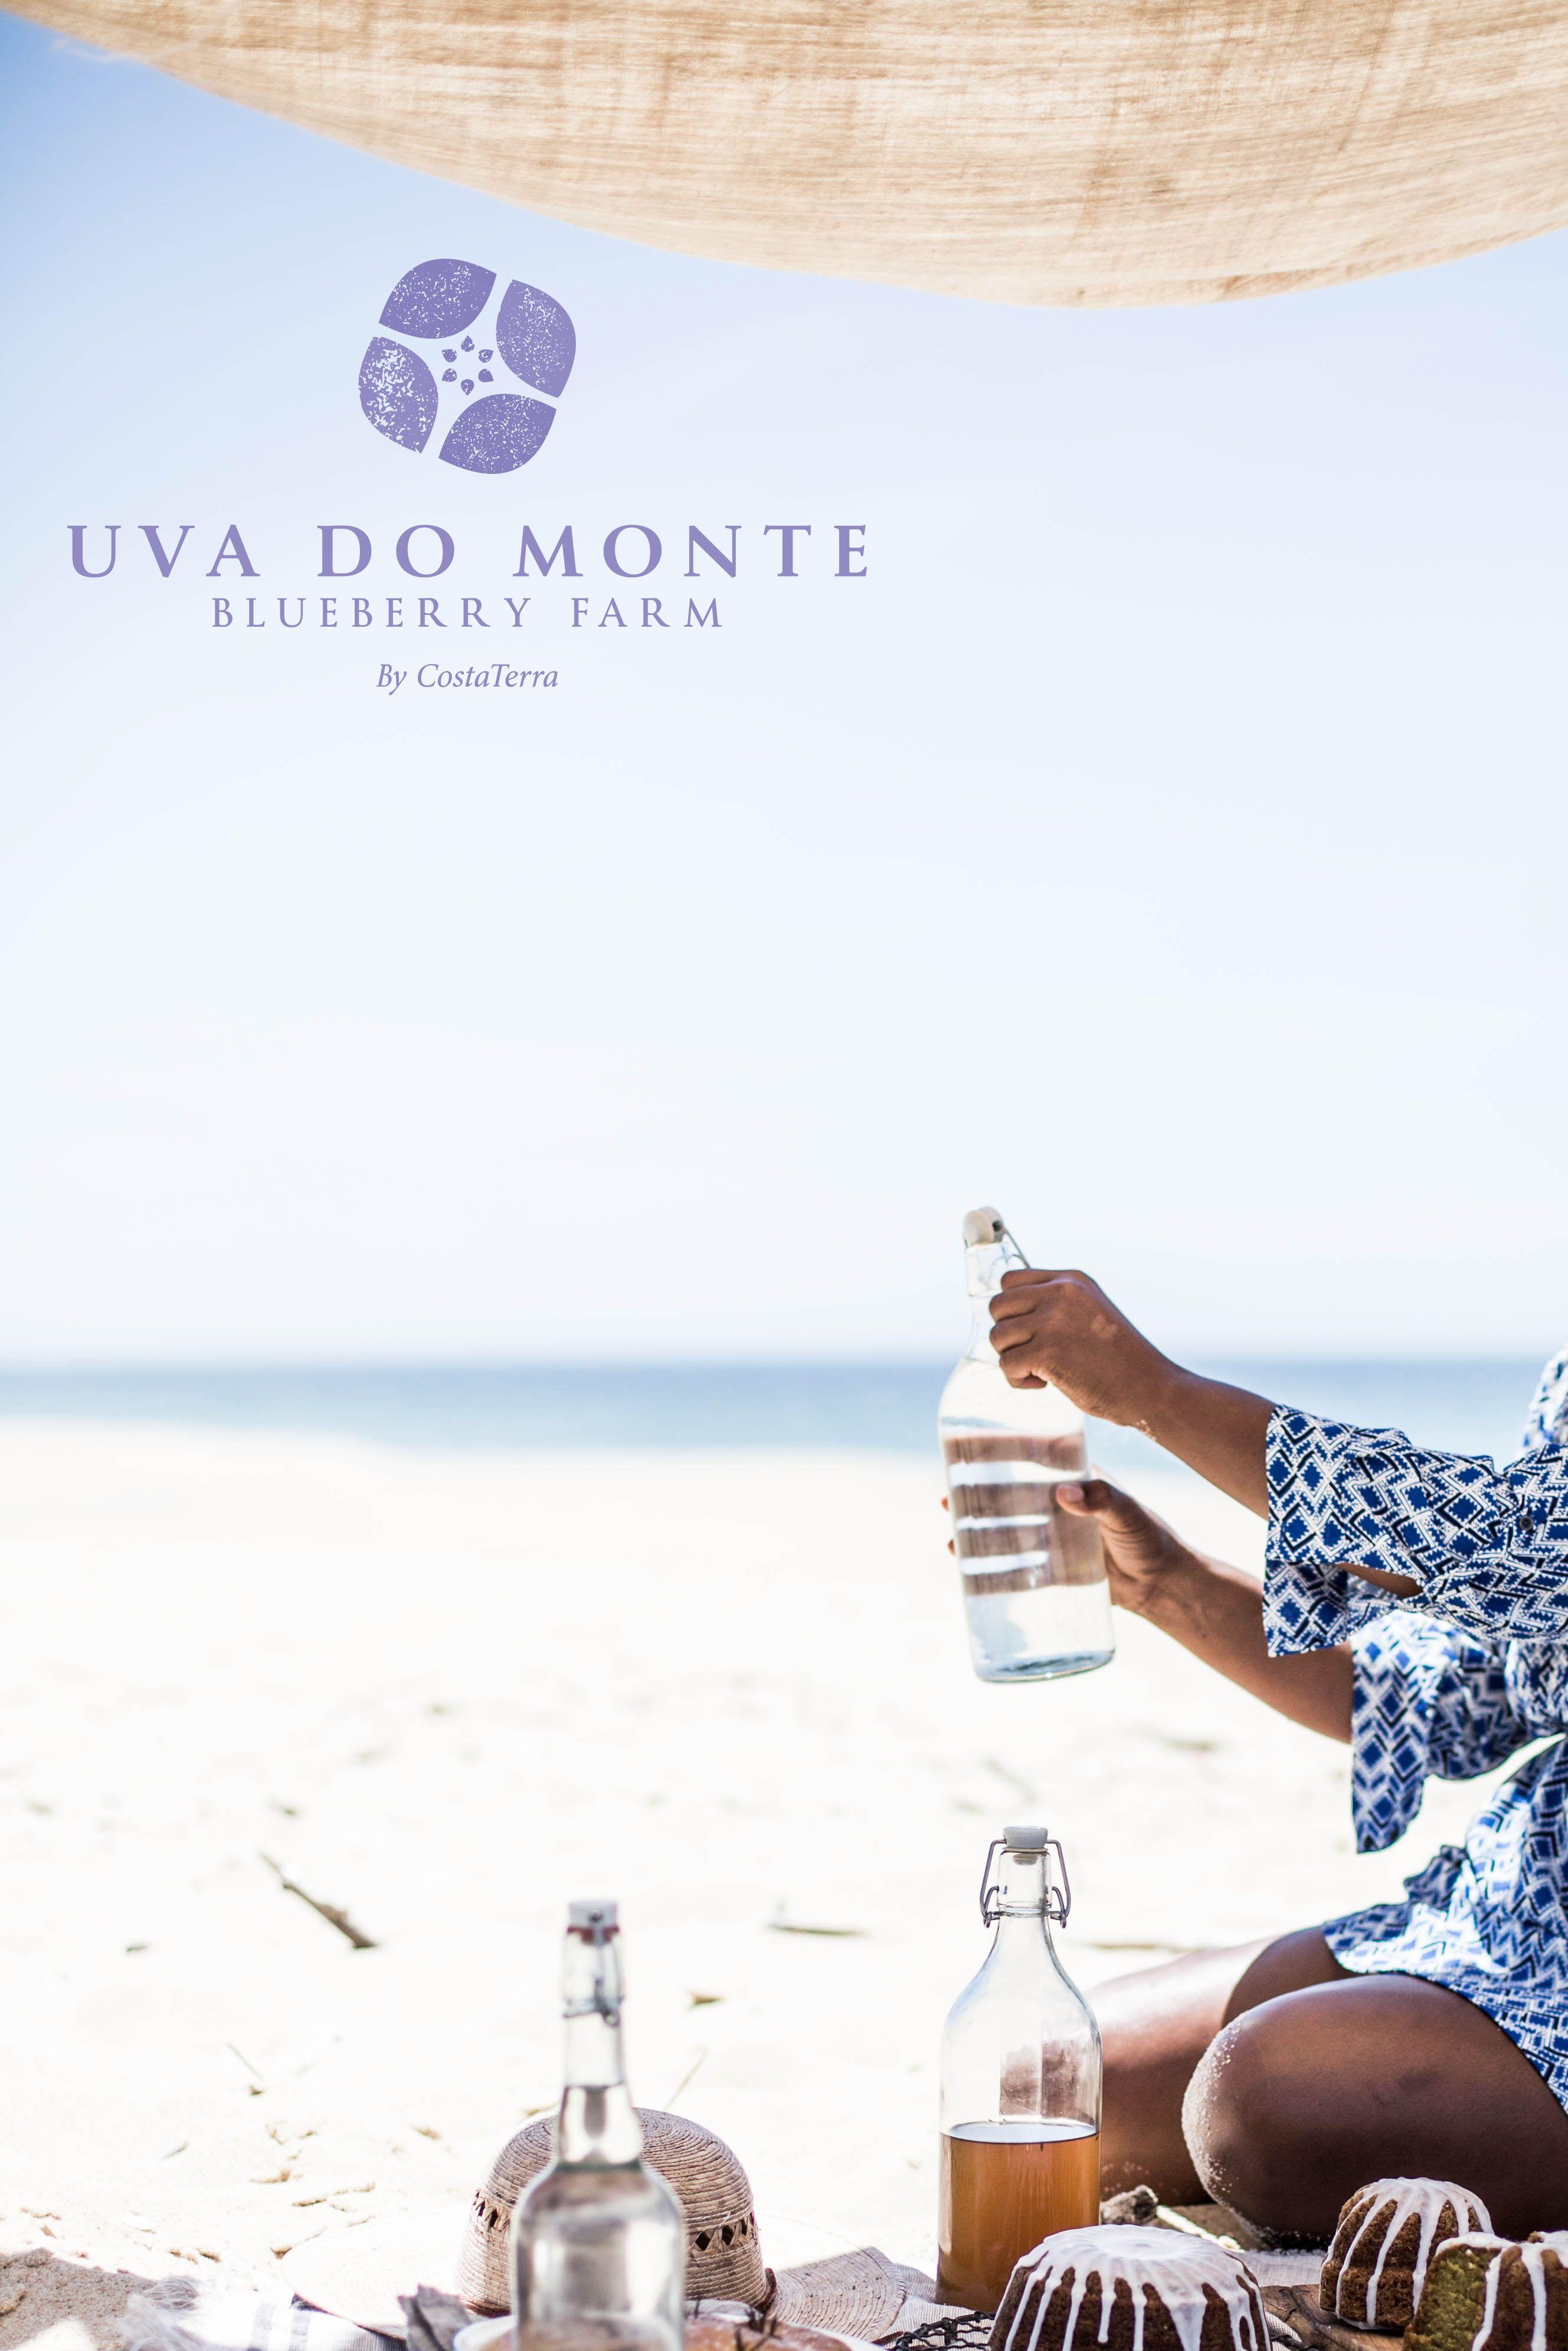 Uva do Monte - Blueberry Farm by Costaterra @theindependentecollective